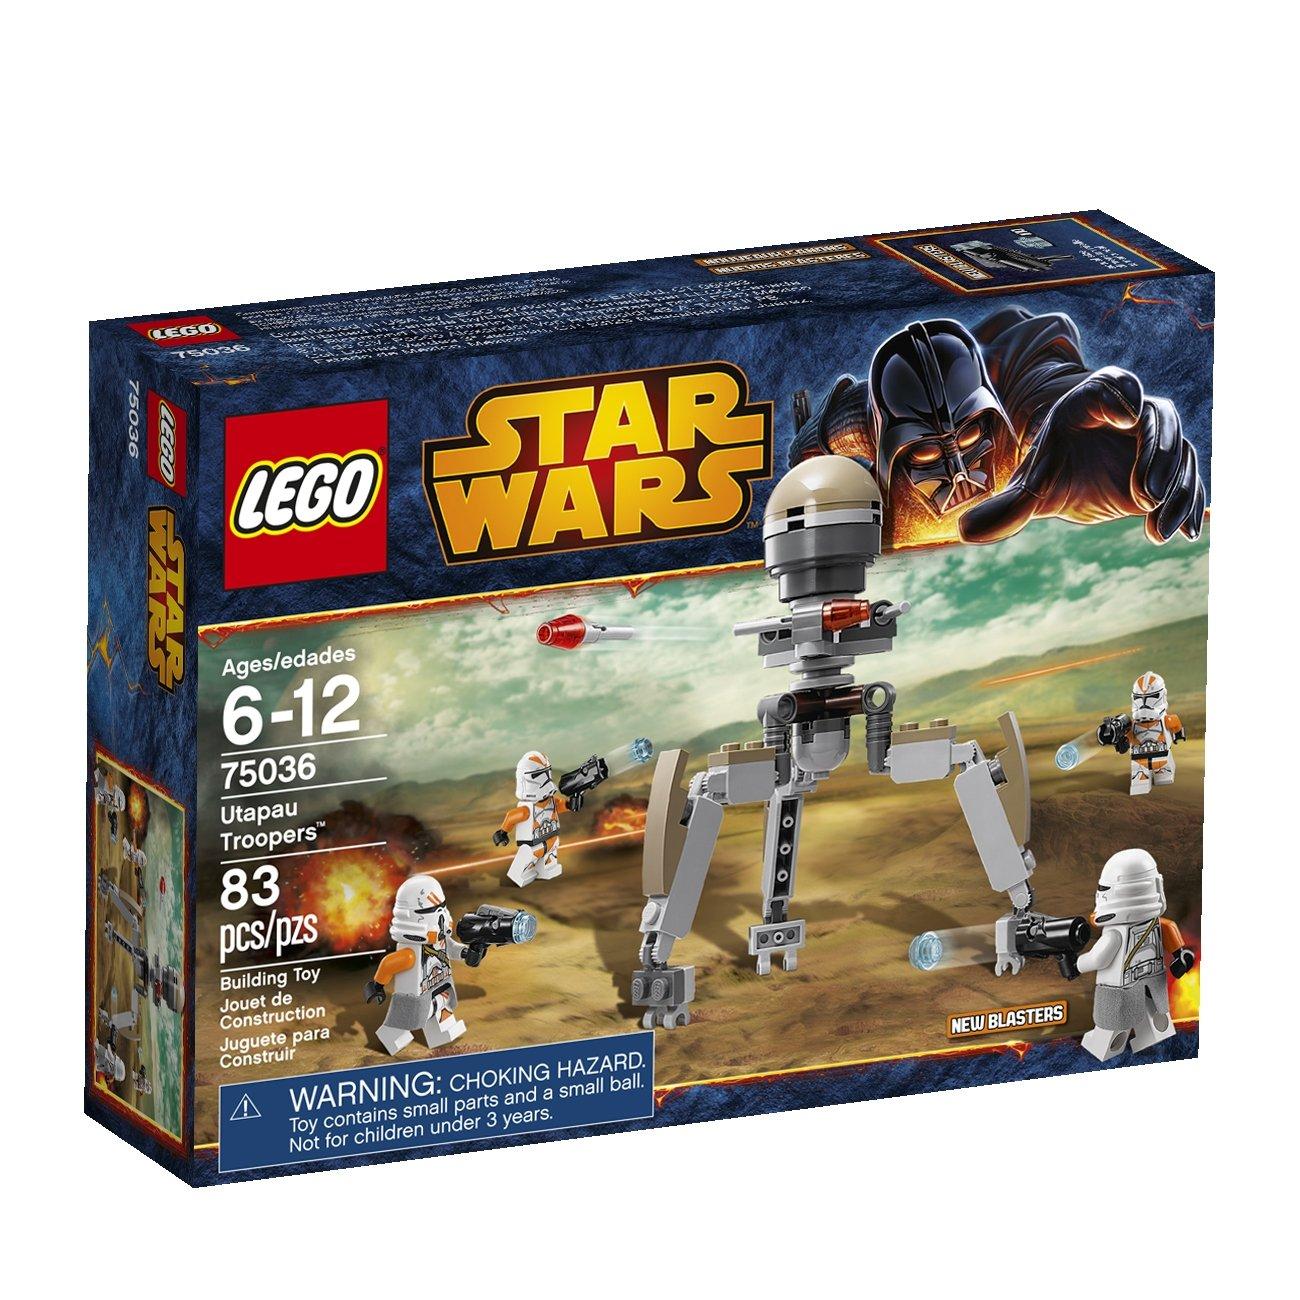 Lego Star Wars Utapau Troopers [75036 - 83 PCS]